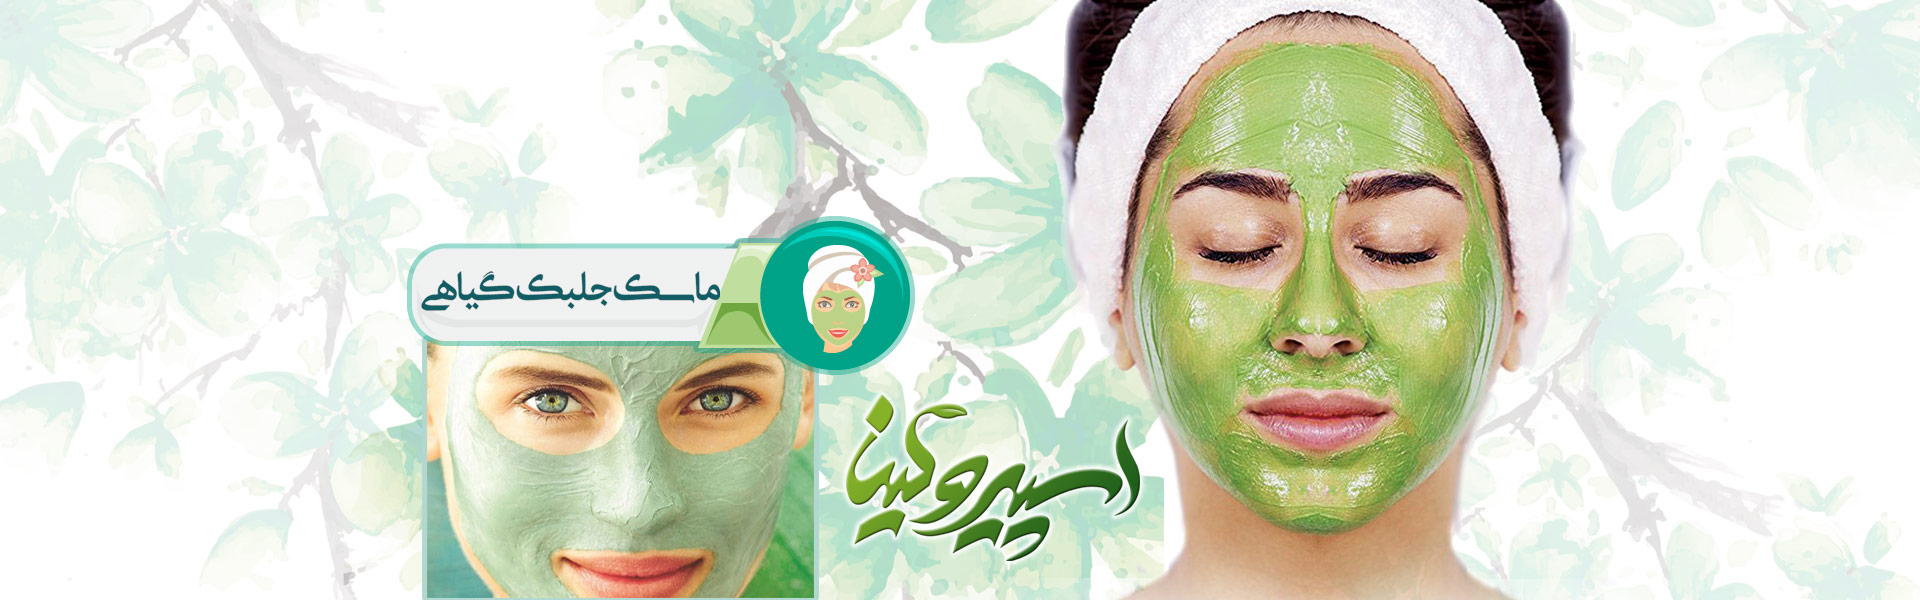 spirulina-algae-mask